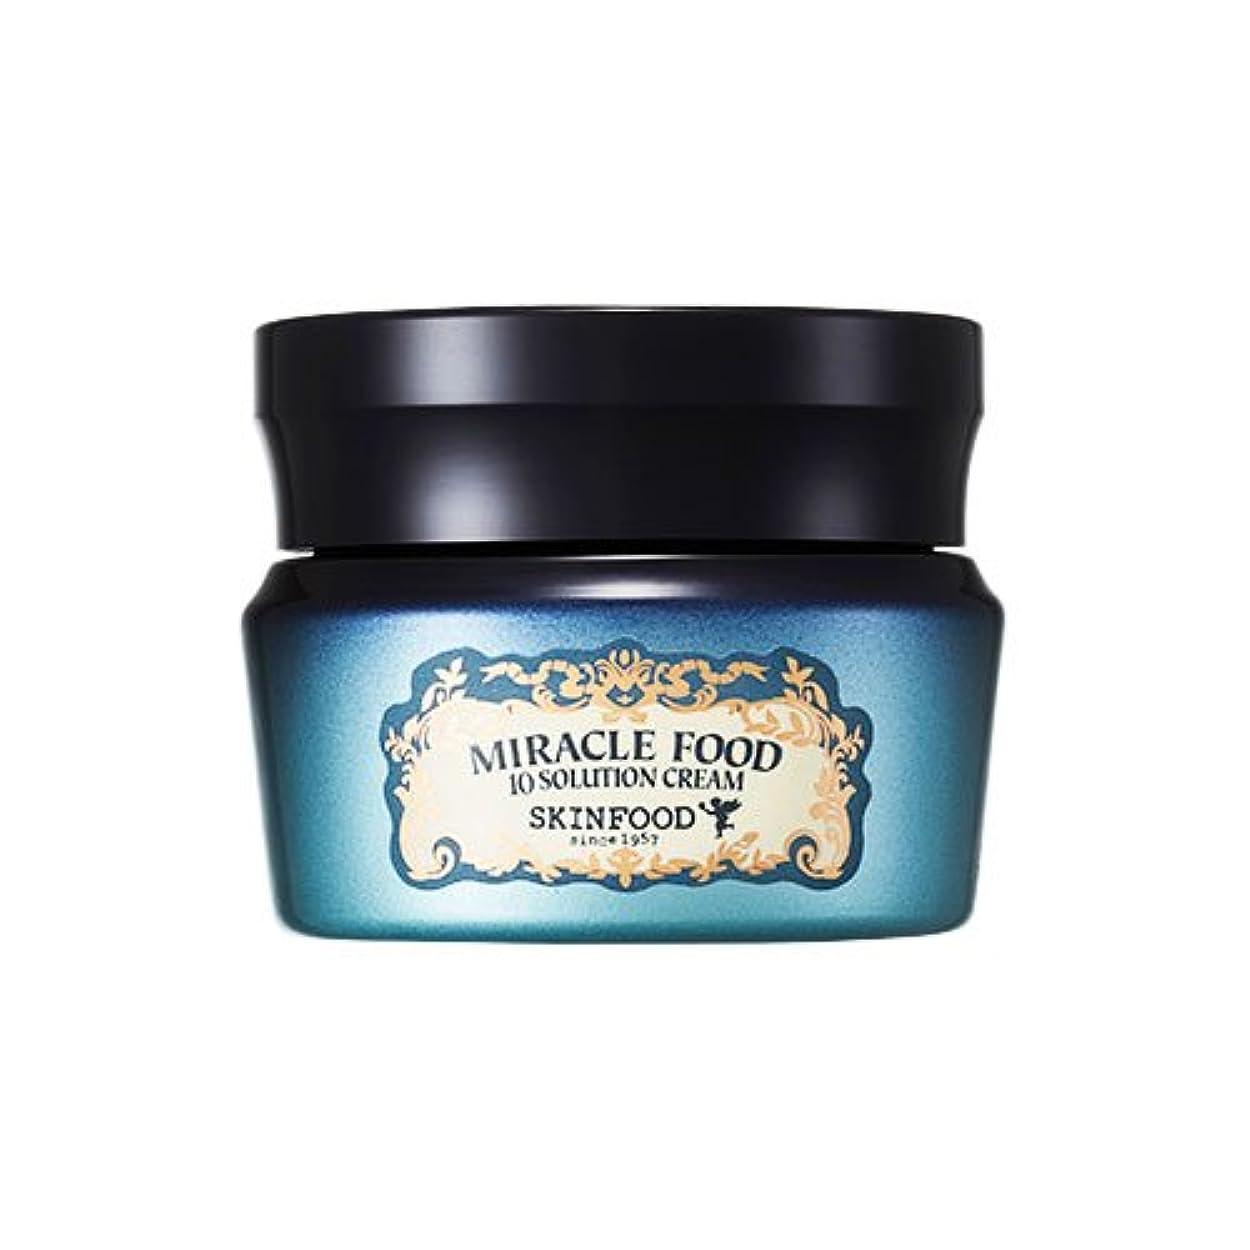 Skinfood ミラクルフード10ソリューションクリーム(美白効果としわ防止効果) / Miracle Food 10 Solution Cream (Skin-Brightening and Anti-Wrinkle...